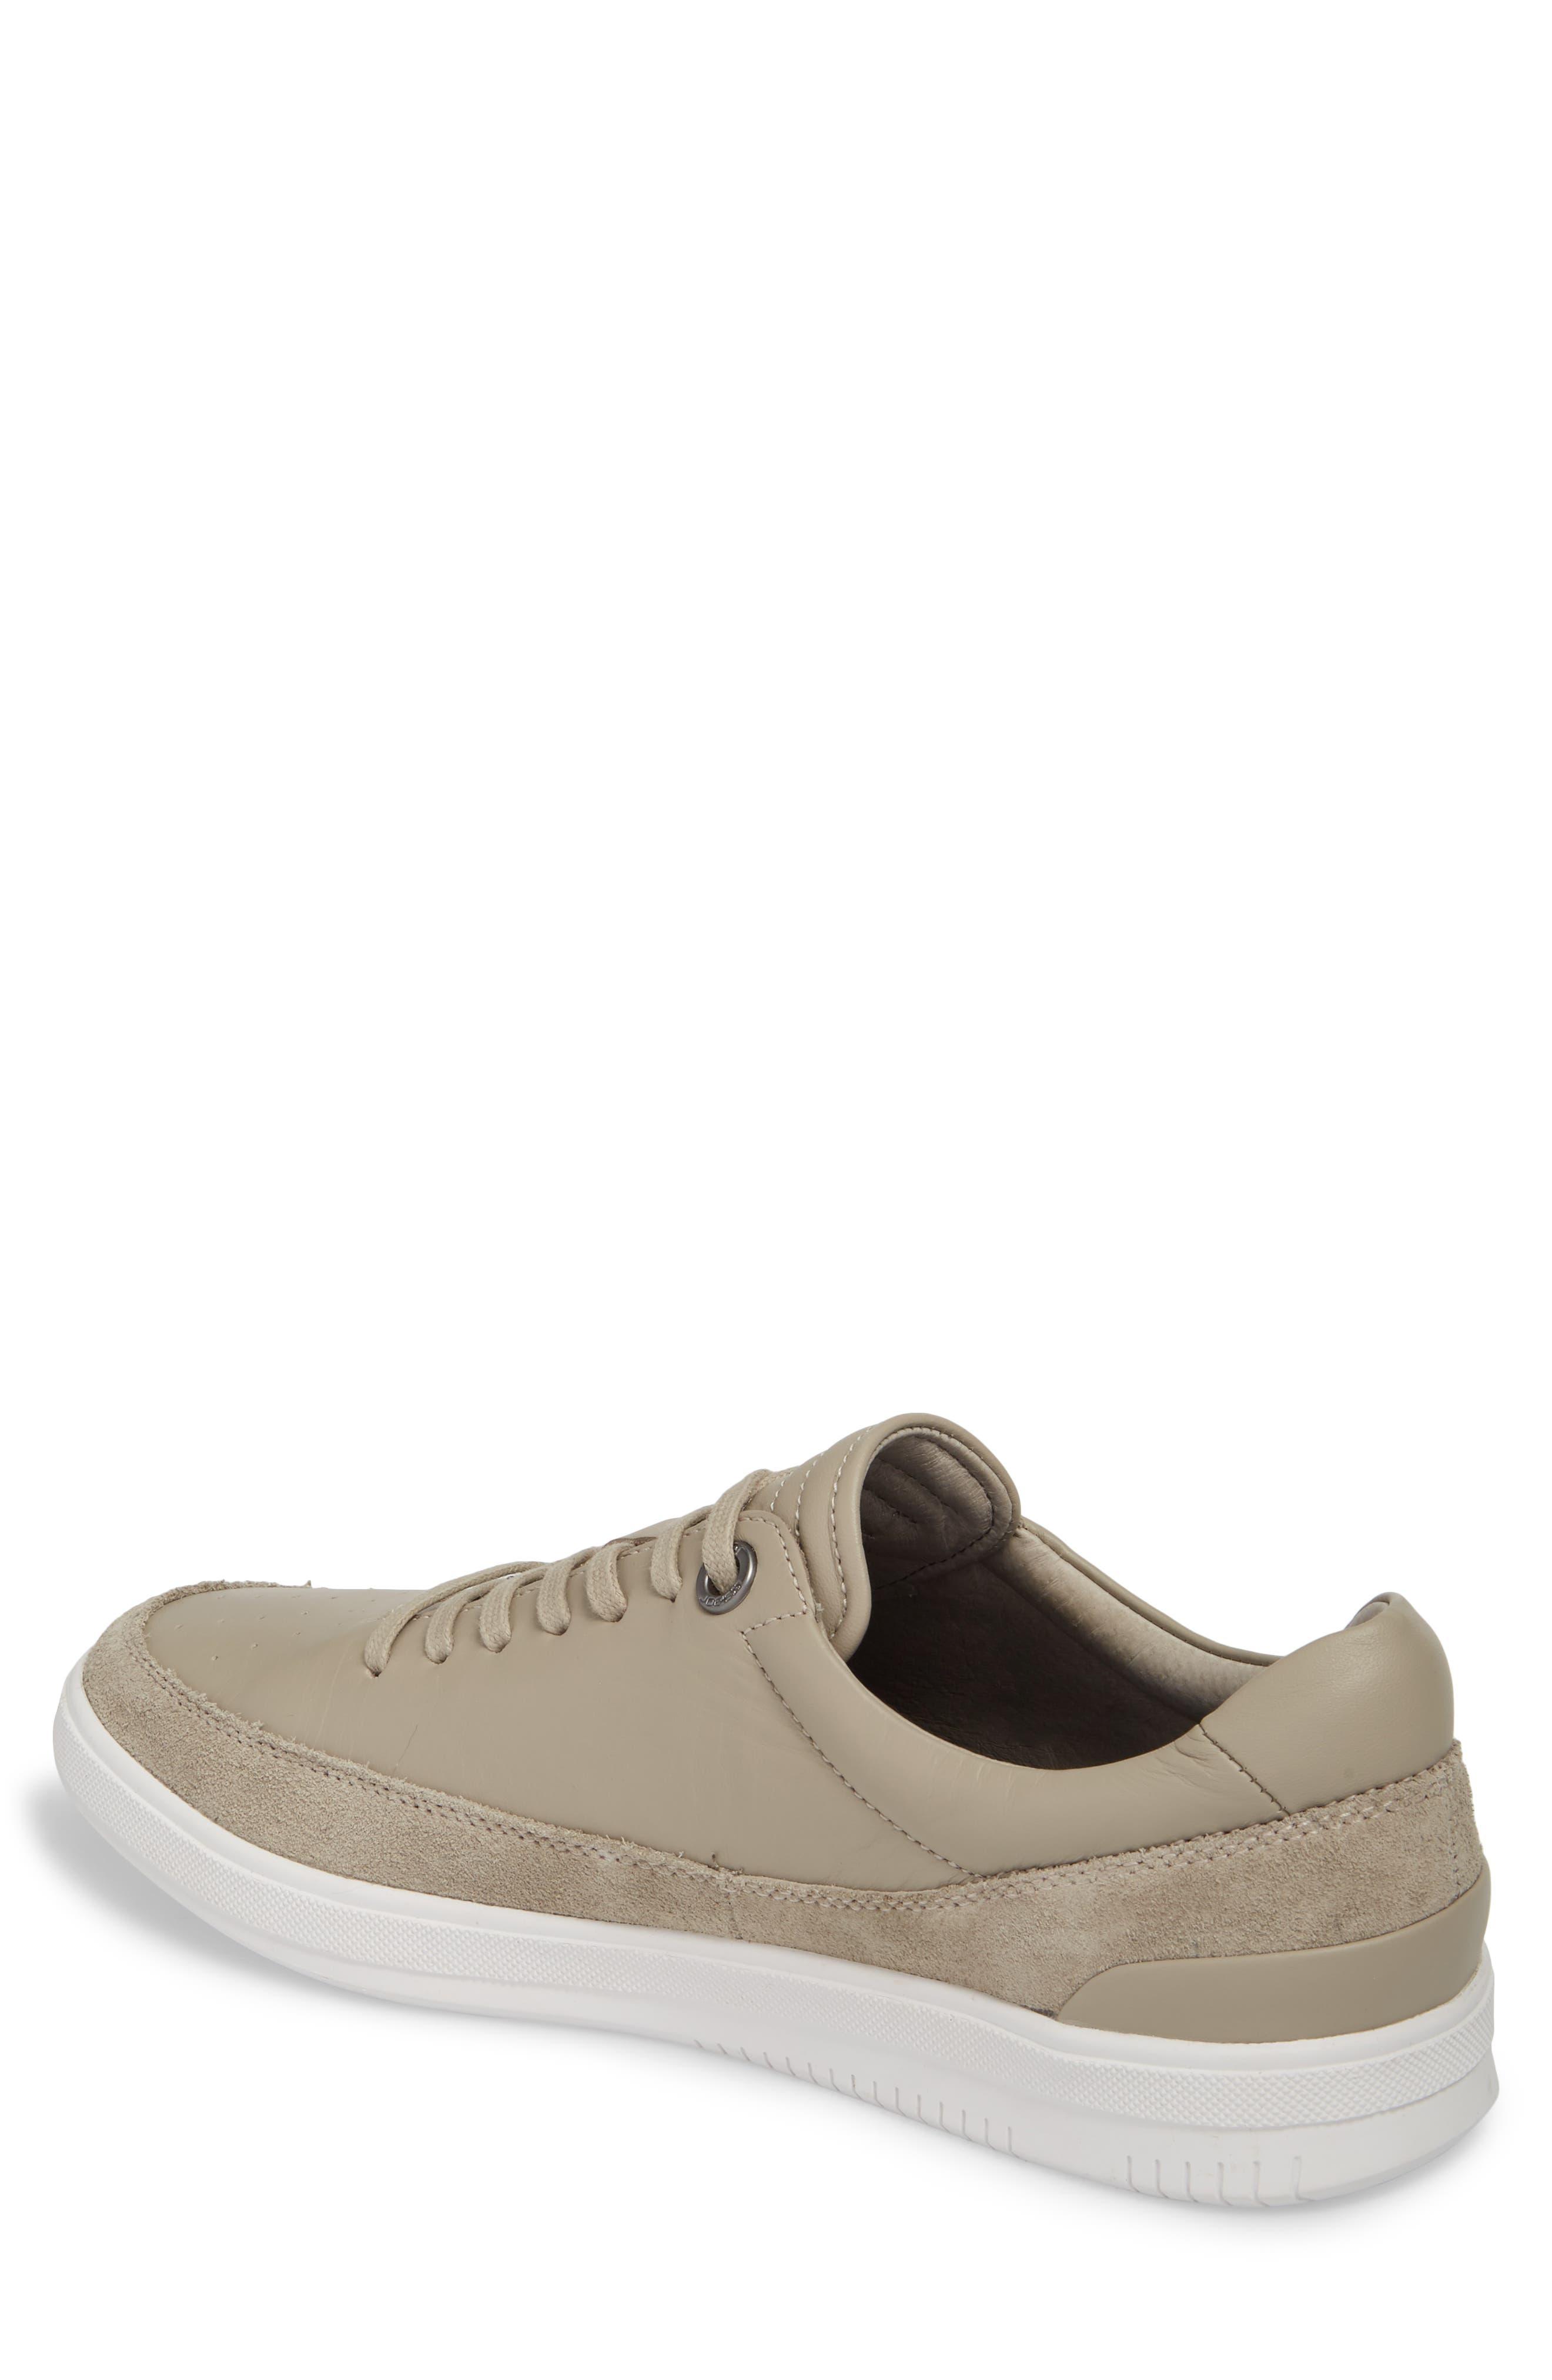 Joe Classic Low Top Sneaker,                             Alternate thumbnail 2, color,                             Stone Leather